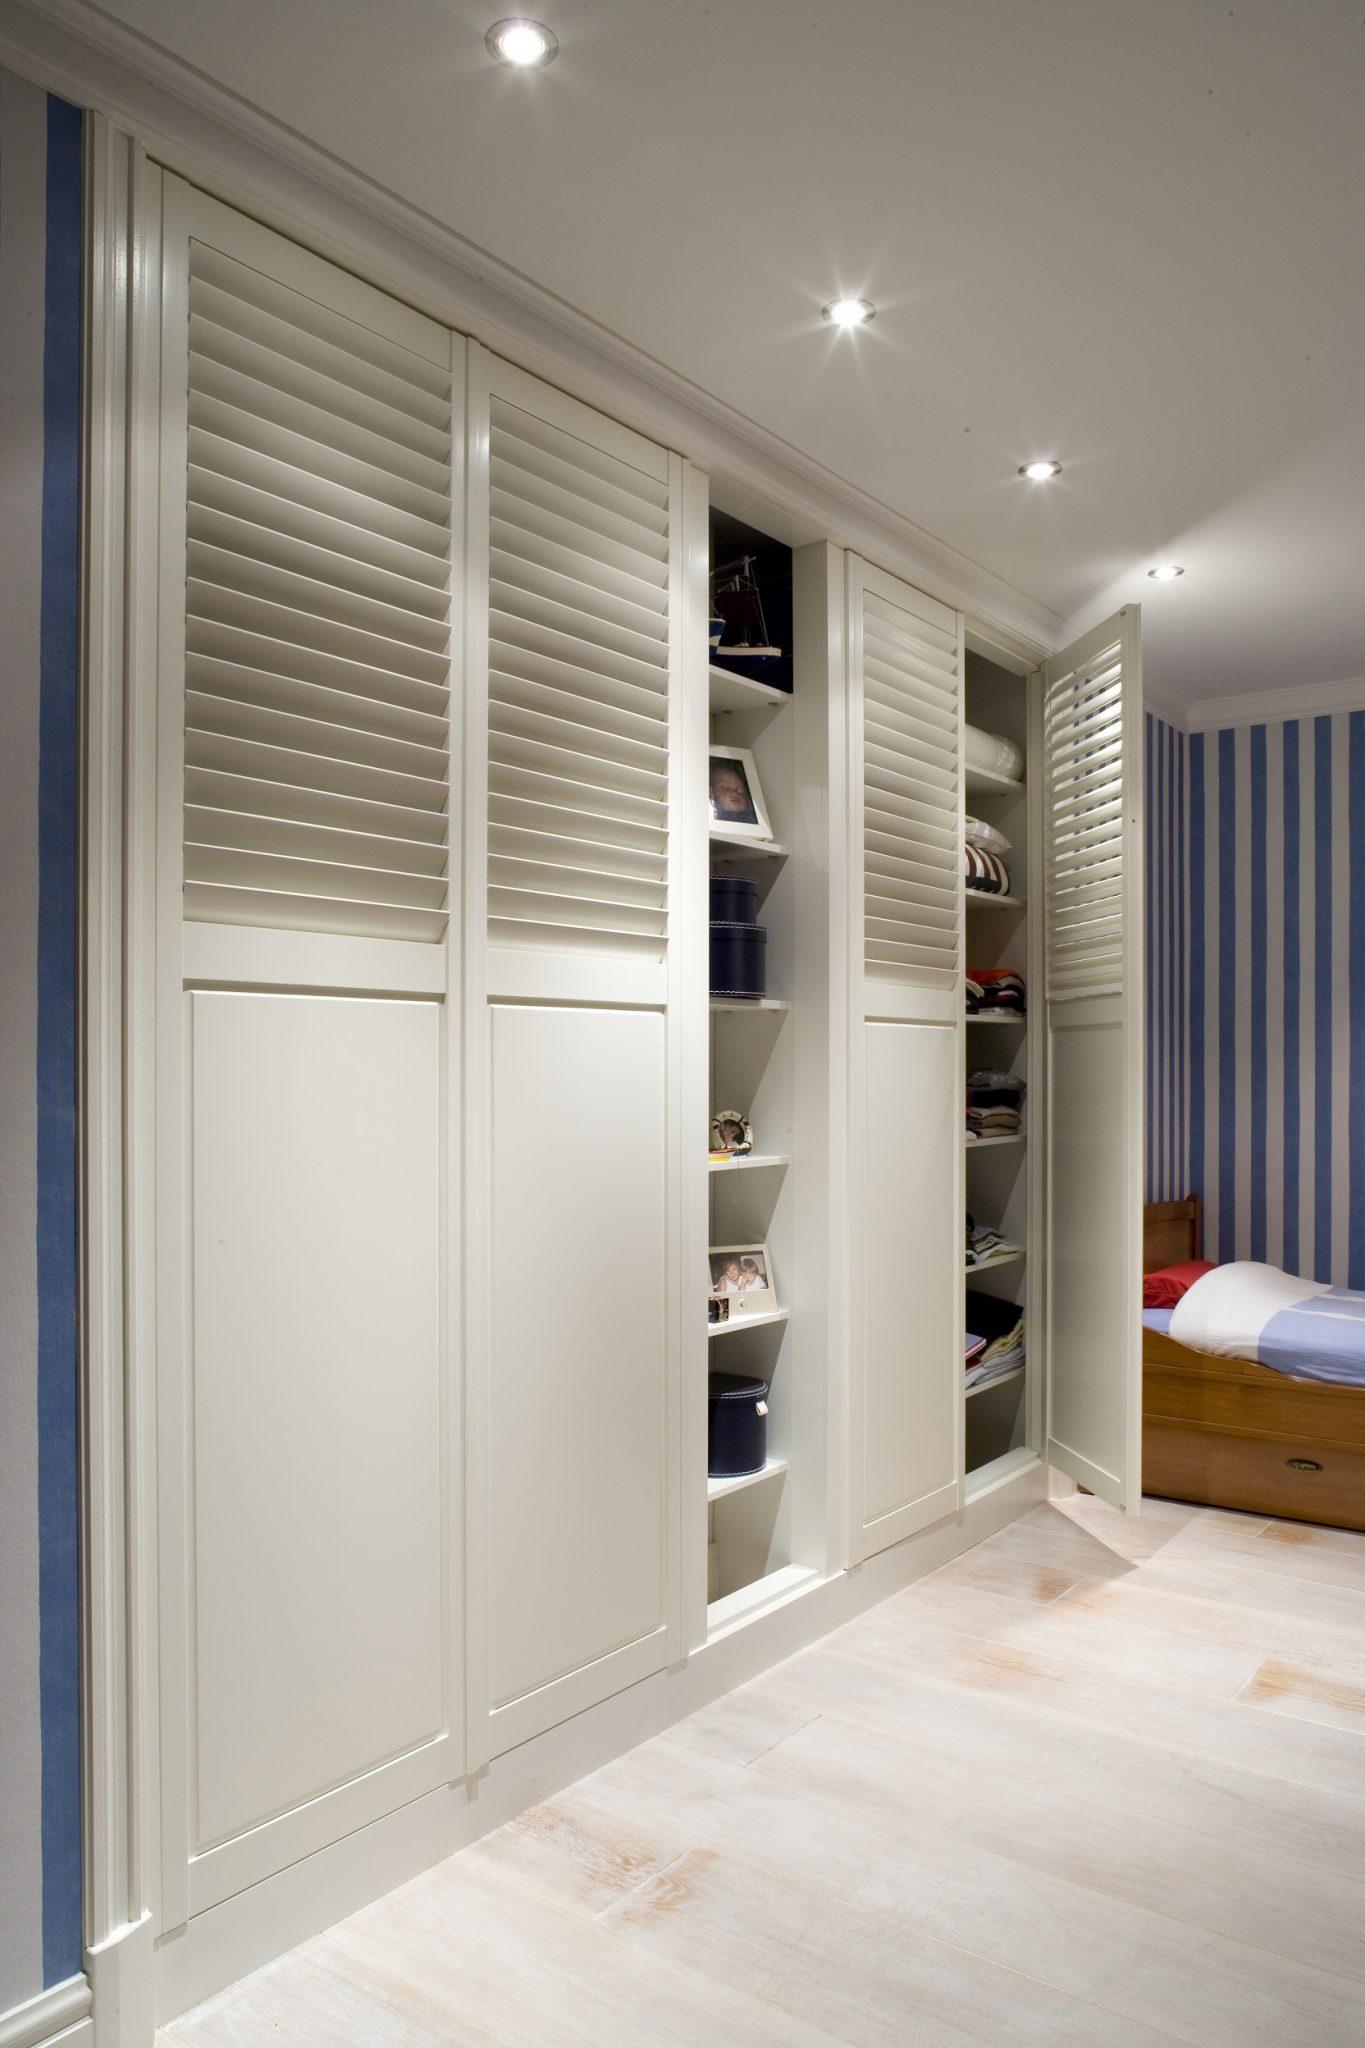 Wardrobe Door Shutter Gallery From S Craft